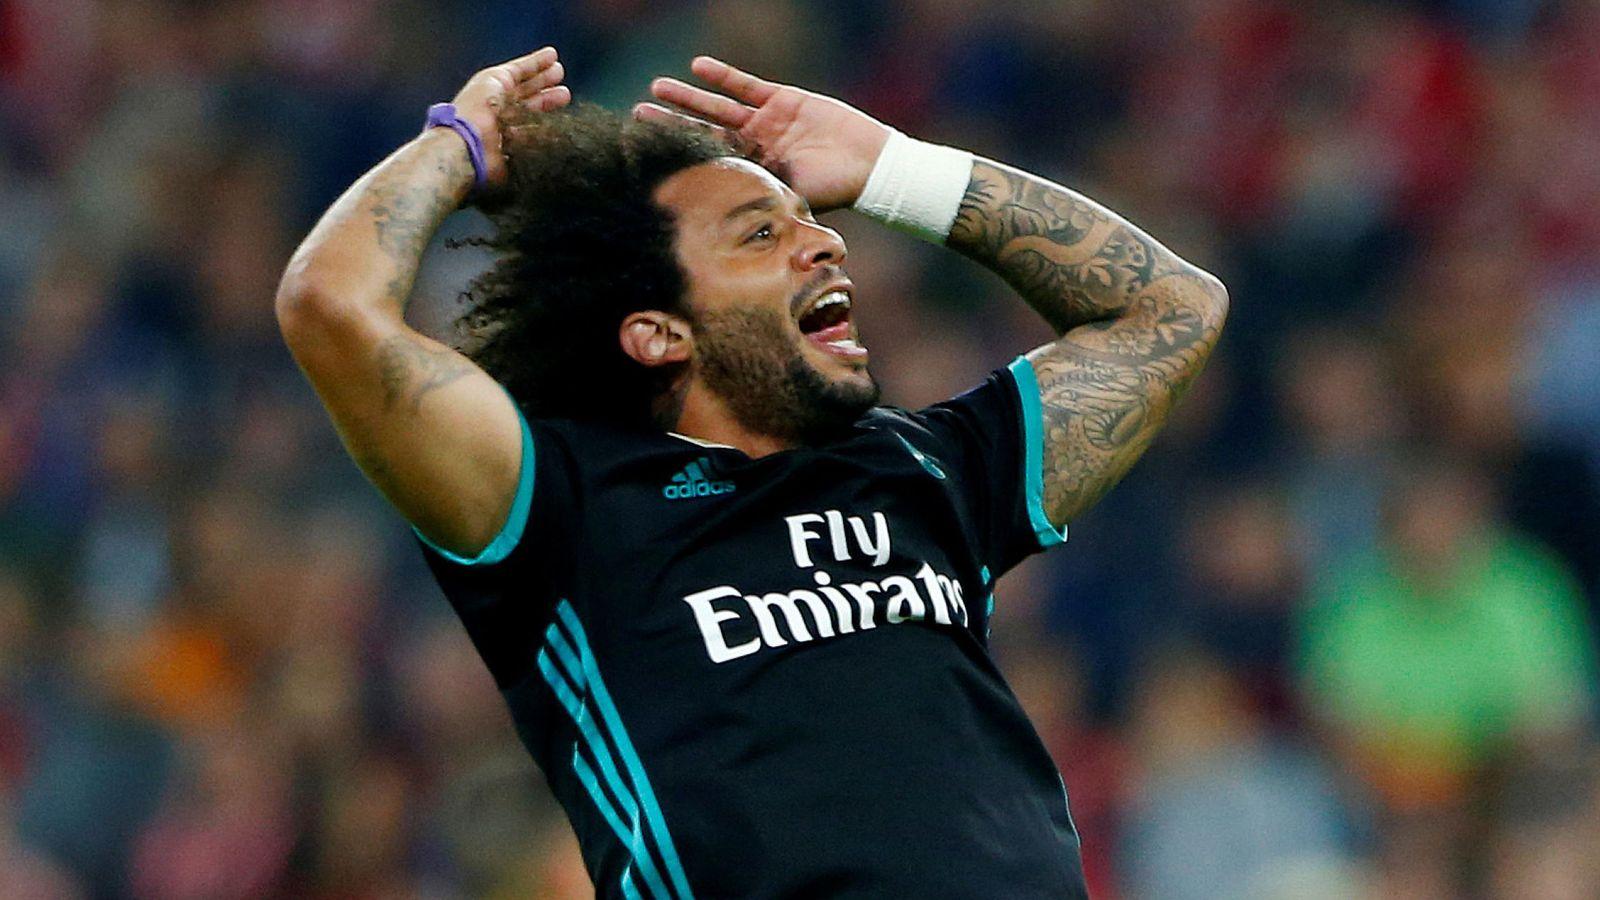 Foto: Marcelo celebra un gol con rabia durante un partido de la Champions League. (Reuters)